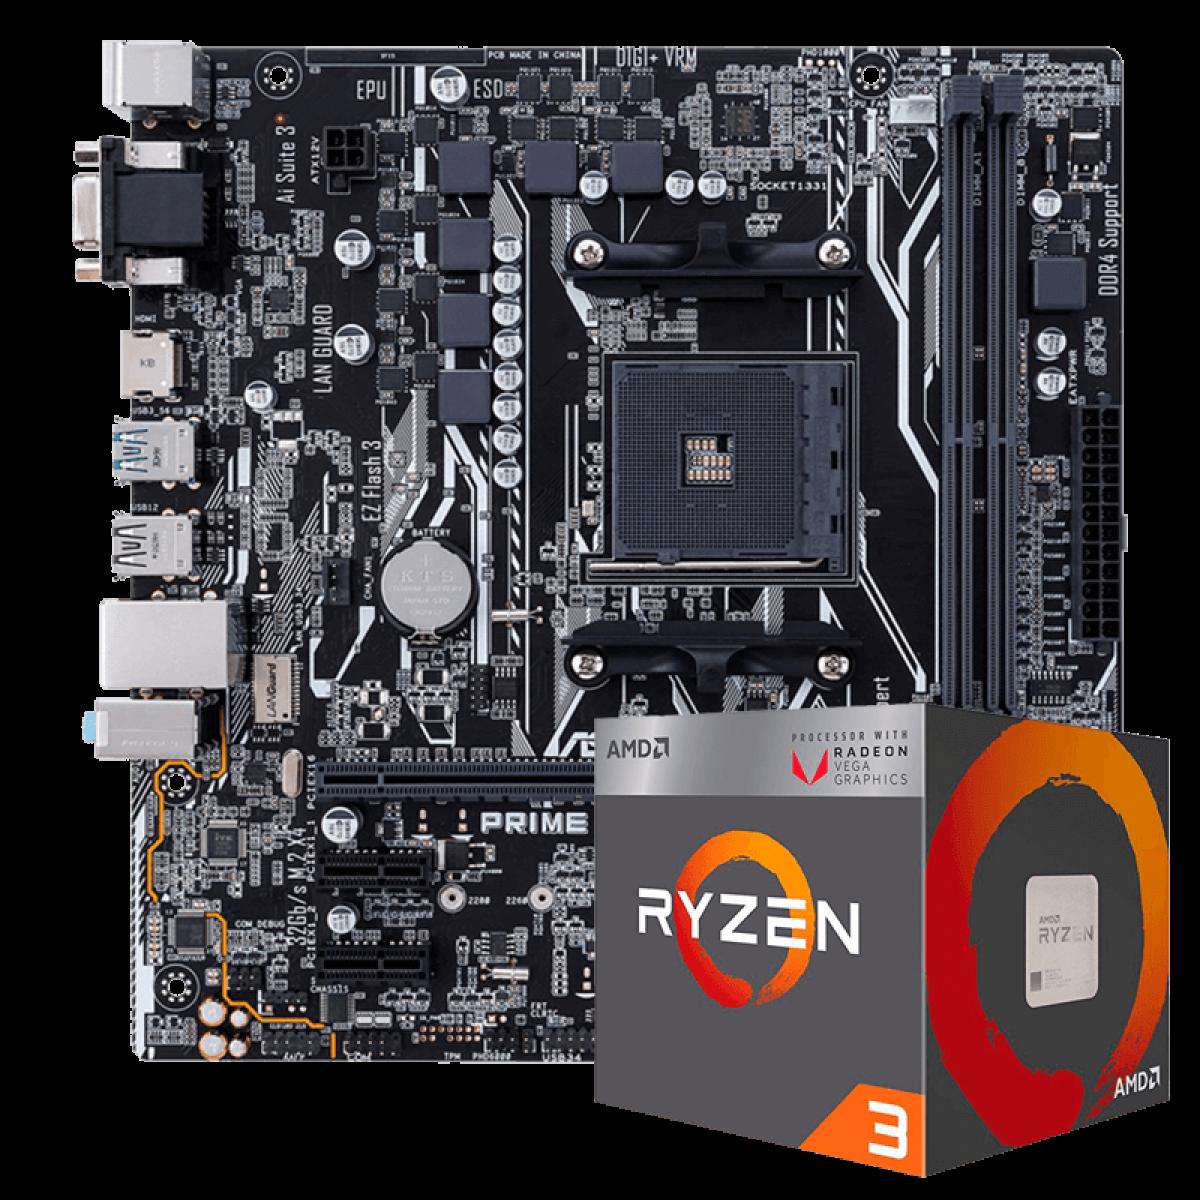 Kit Upgrade Placa Mãe Asus PRIME A320M-K DDR4 + PROCESSADOR AMD RYZEN 3 2200G 3.5GHZ